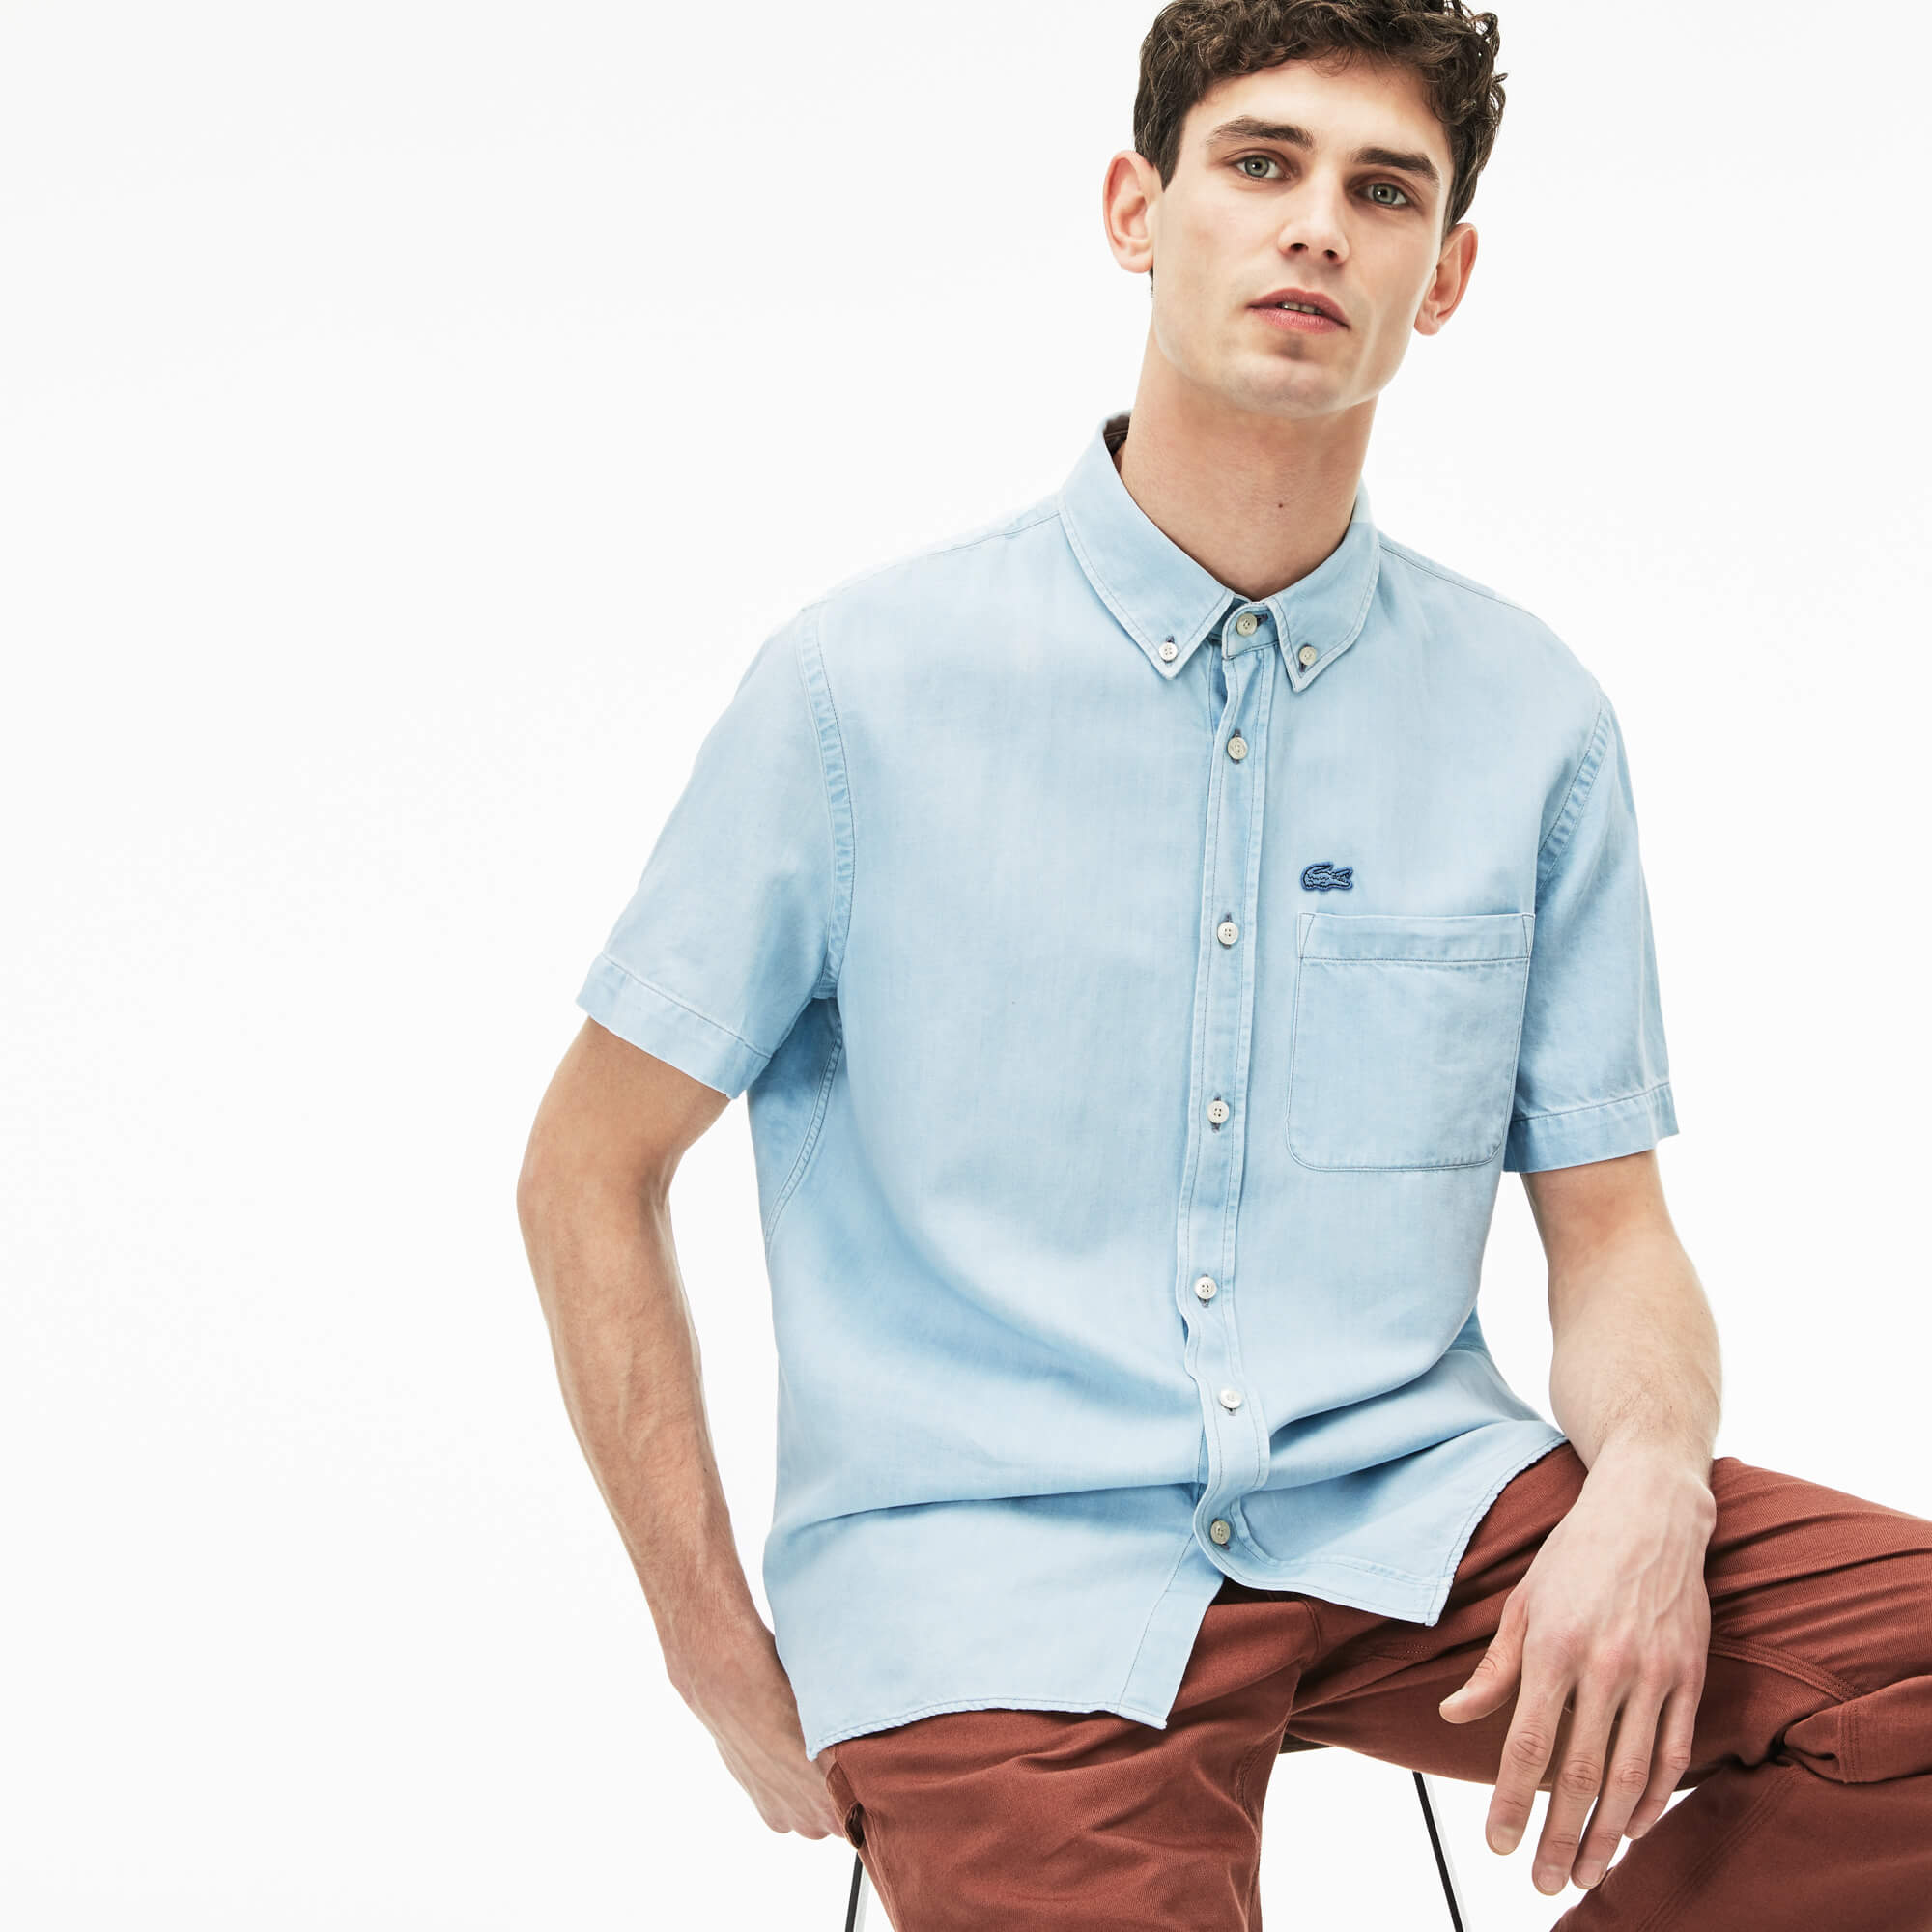 Herren Relaxed Fit Hemd aus leichtem Denim